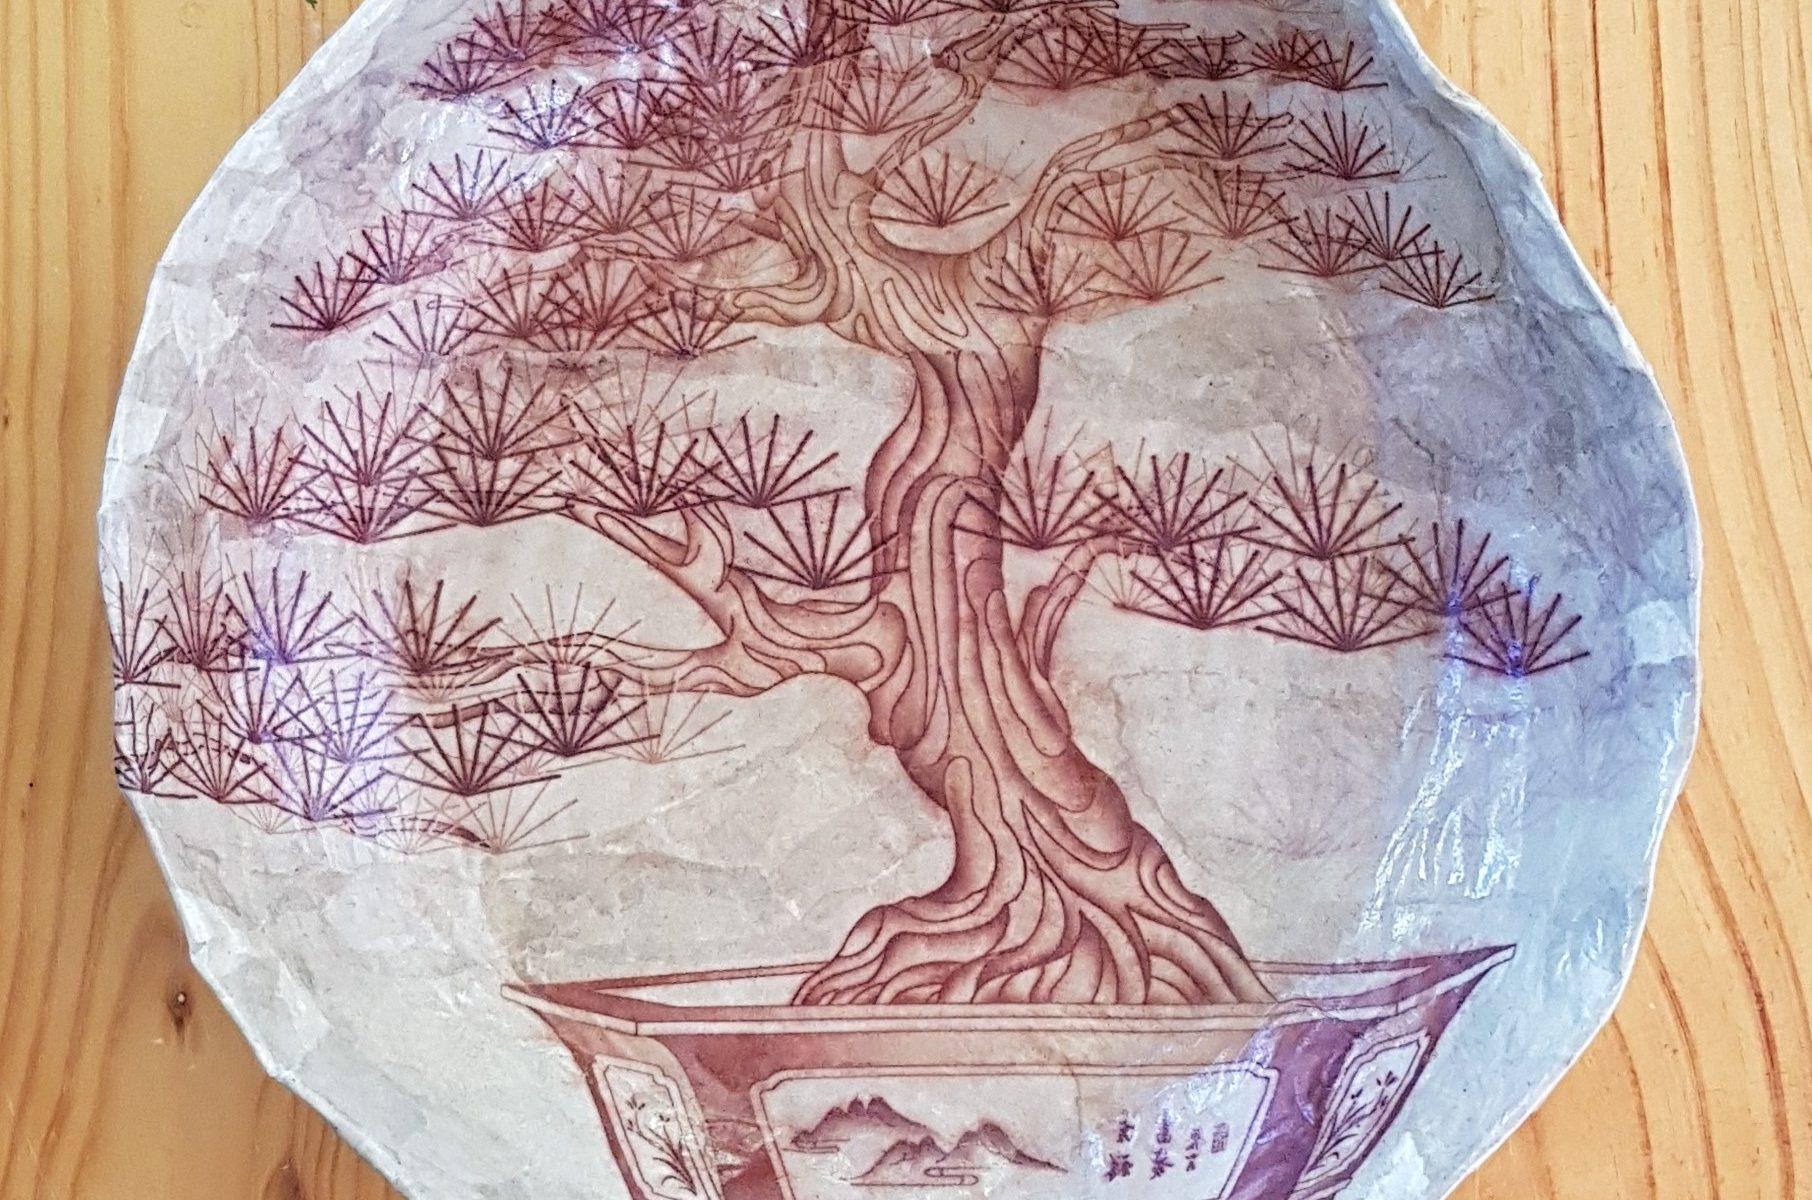 Bowl 5 - Zen Garden